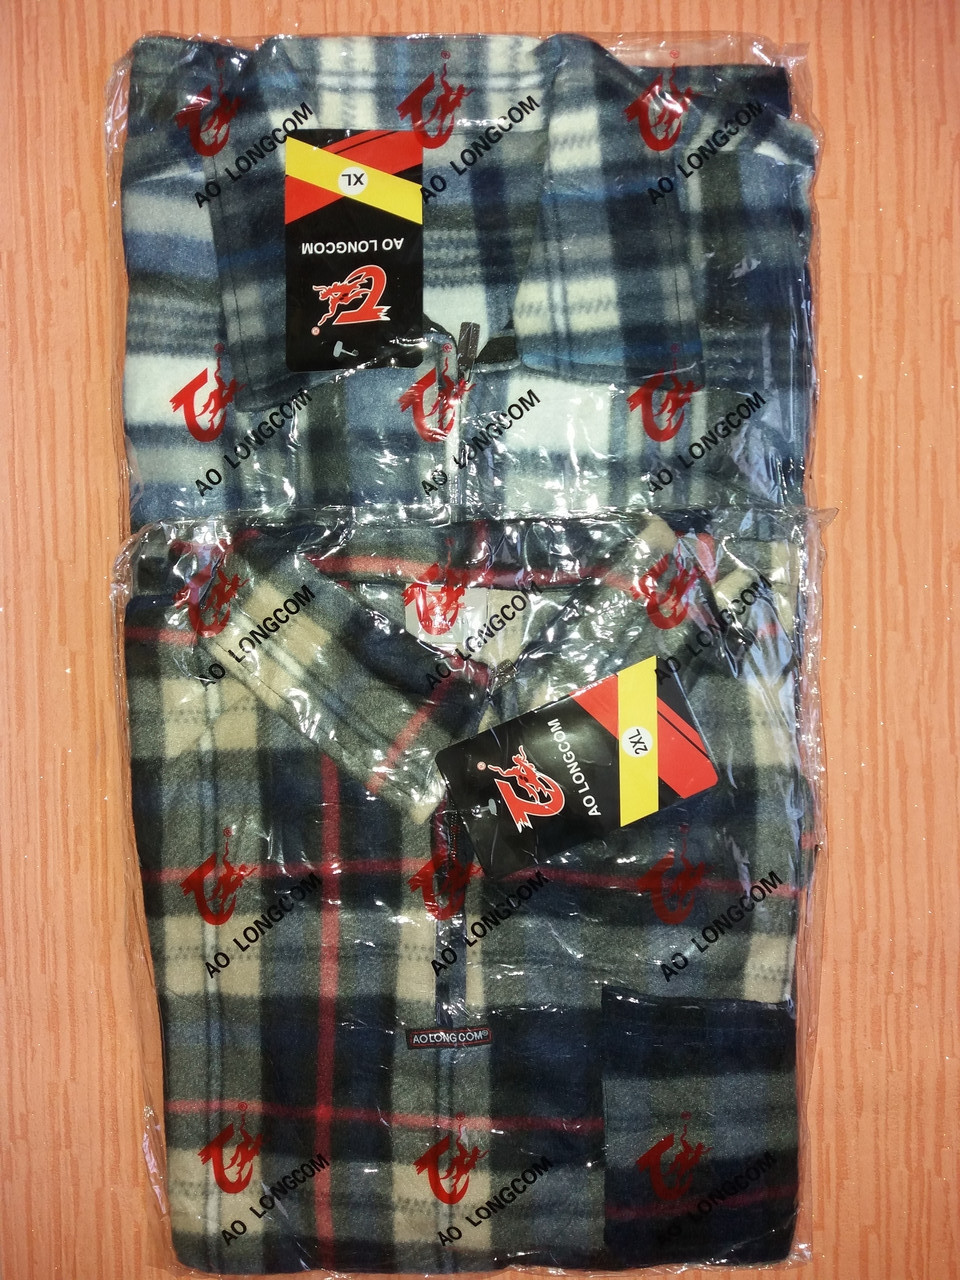 Рубашки мужские на молнии флис в клетку теплые р.52,54,56,58,60. От 5шт по 109грн.